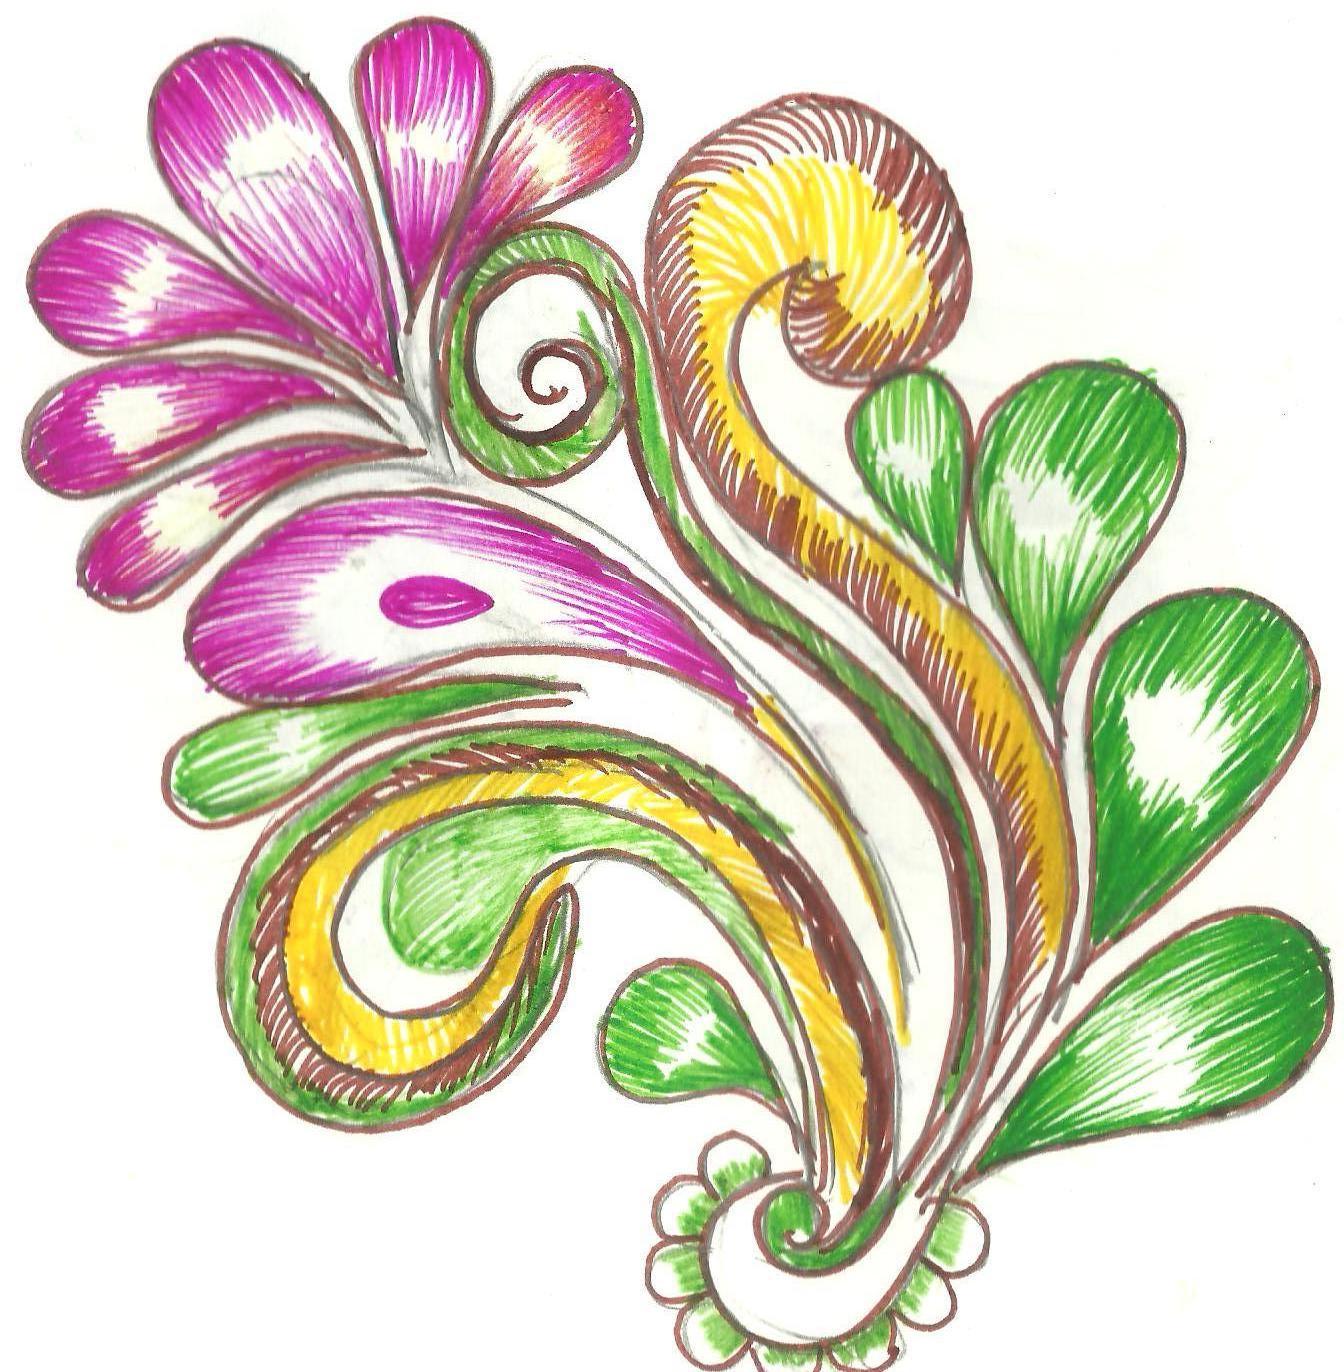 Art N Craft: Beautiful Designs for all purposes